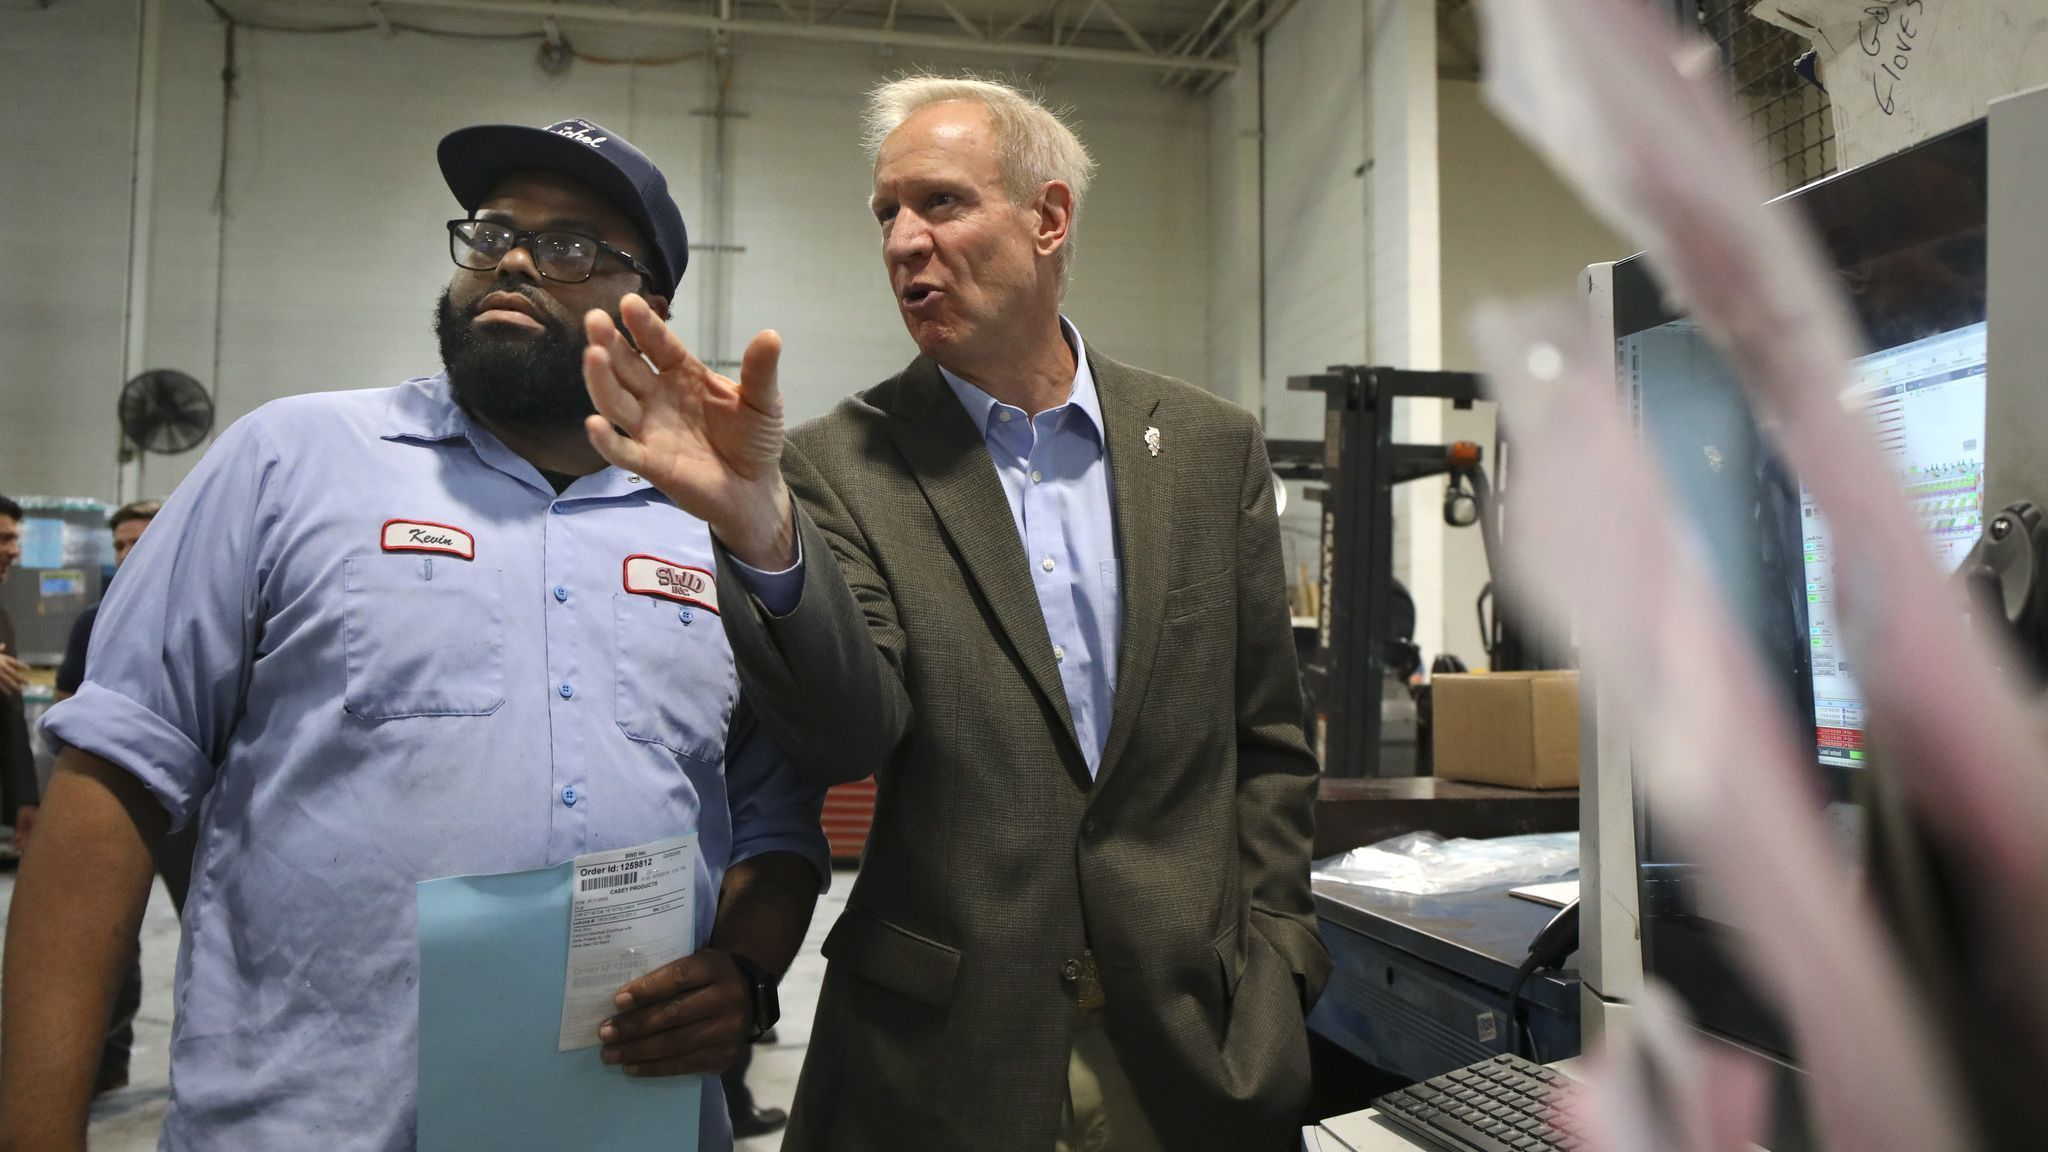 Gov. Bruce Rauner nets endorsement from business groups, assails J.B. Pritzker on tax plan | Chicago Tribune